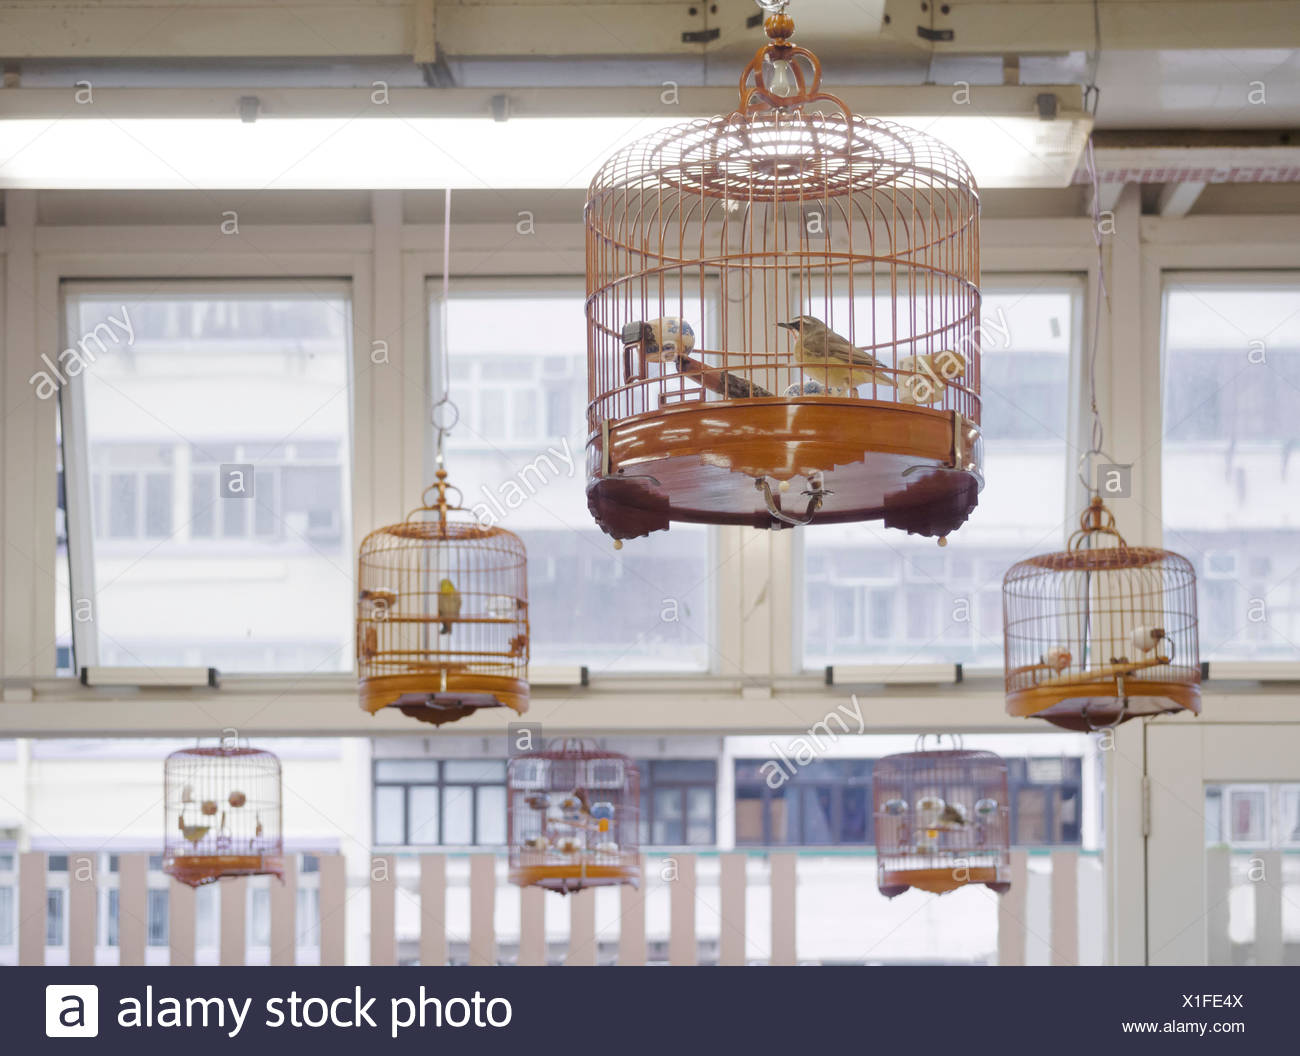 bird singing appreciation hobby - Stock Image